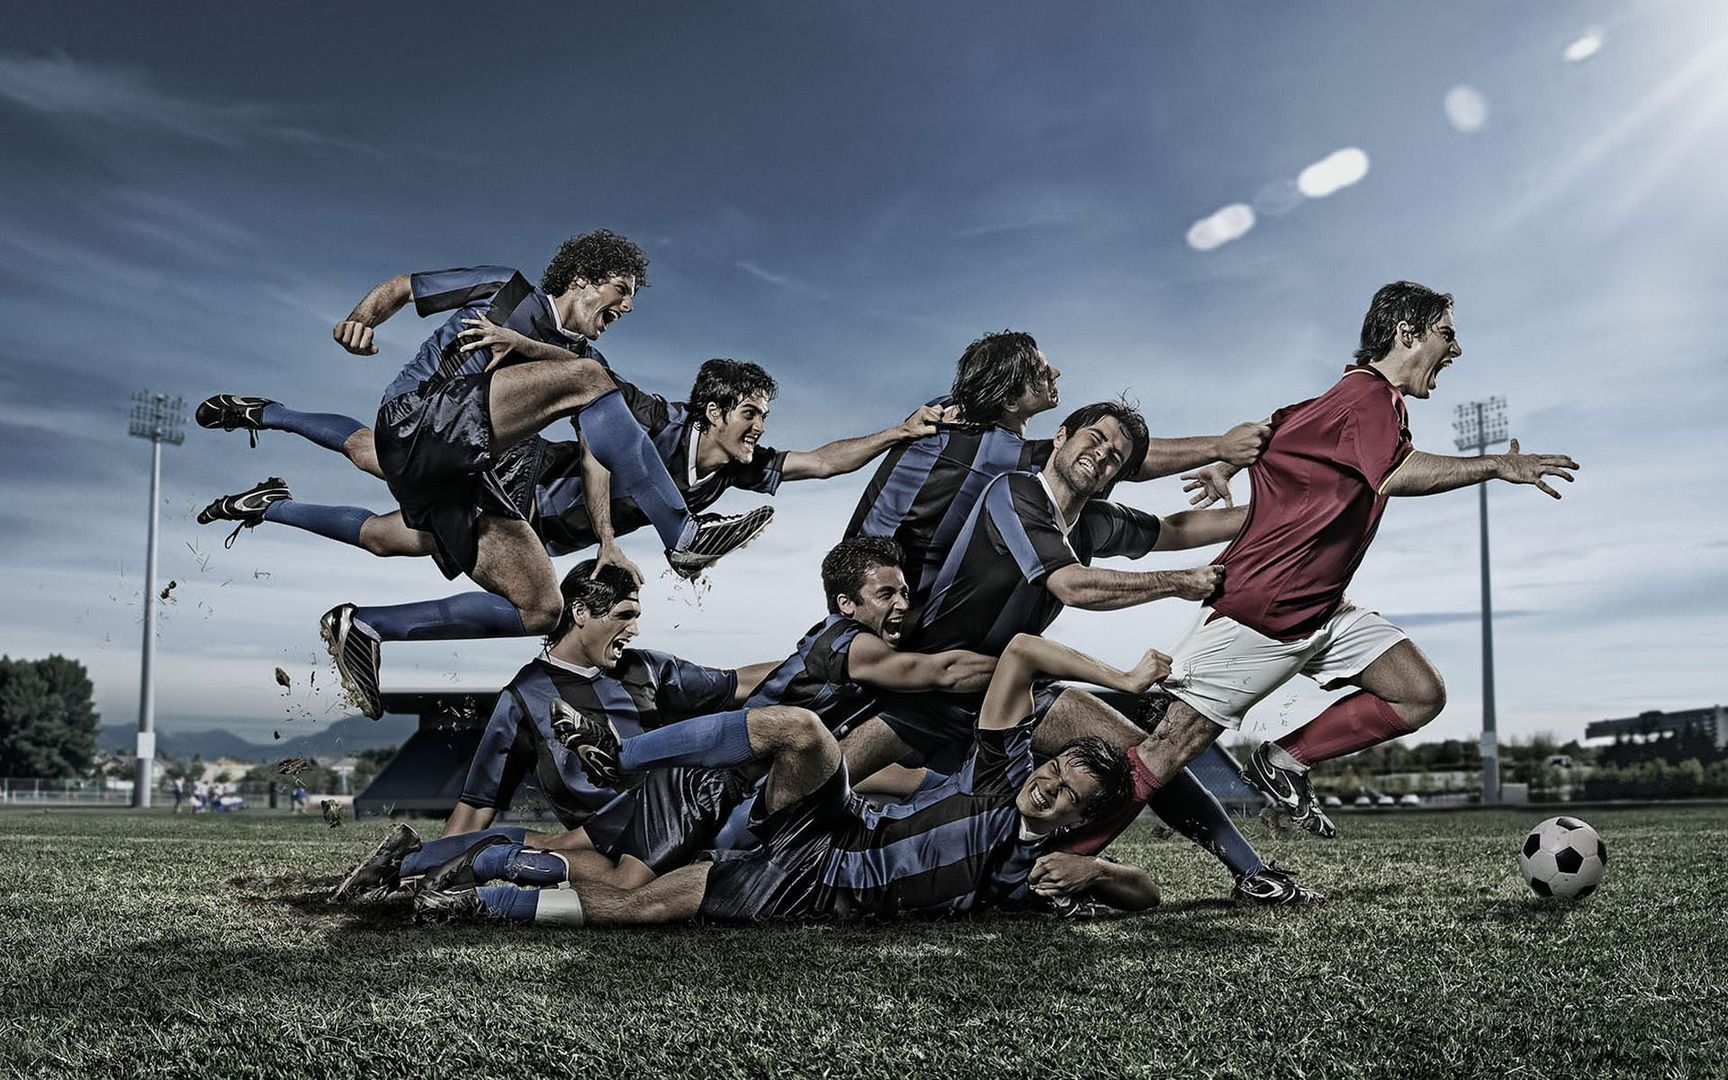 best-ideas-about-Football-on-Pinterest-Futbol-wallpaper-wpc9002798